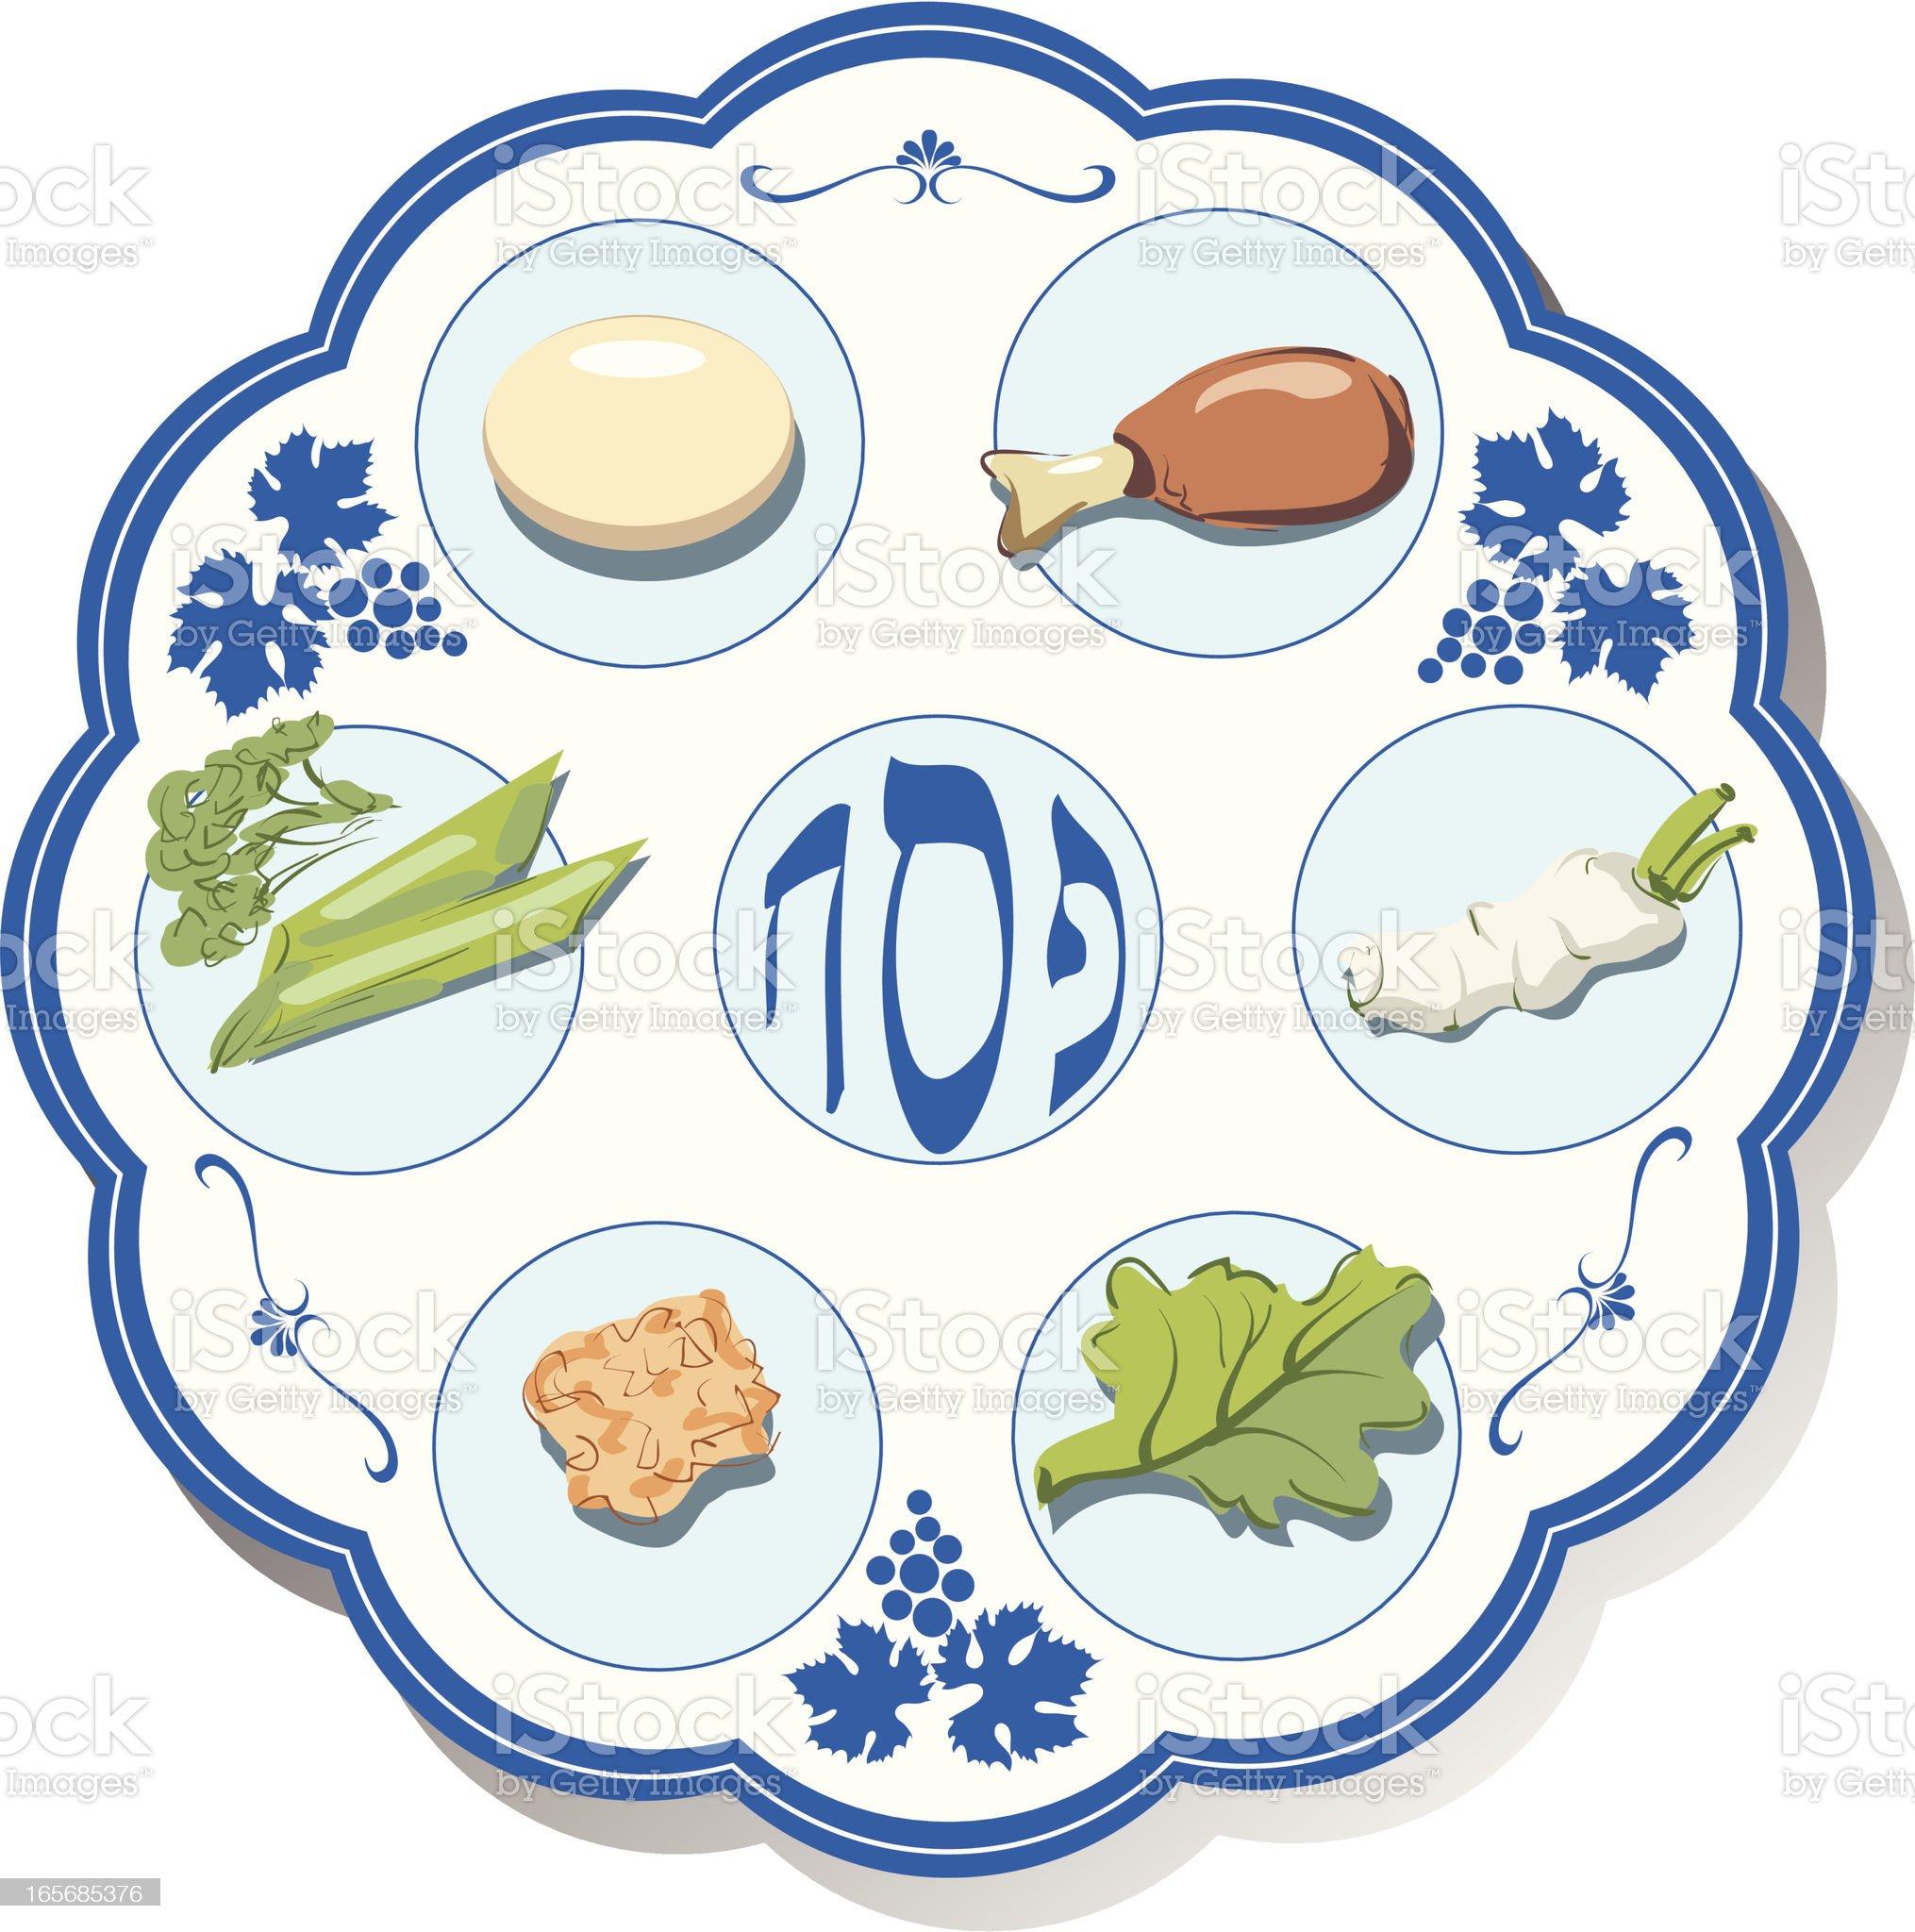 Seder plate royalty-free stock vector art